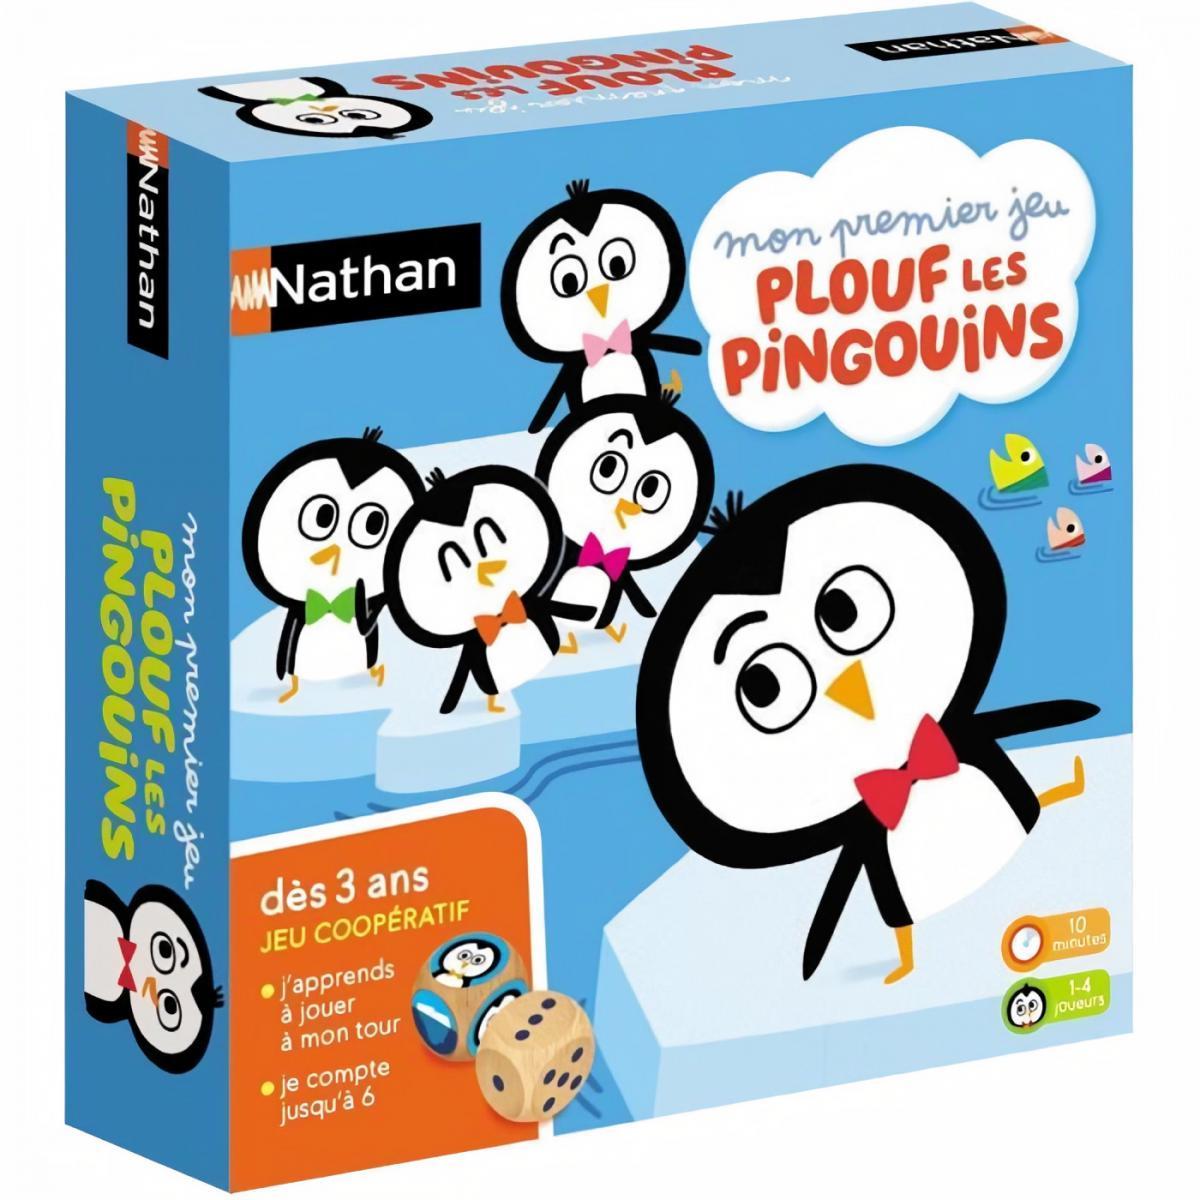 Nathan Nathan Plouf les pingouins, jeu de société